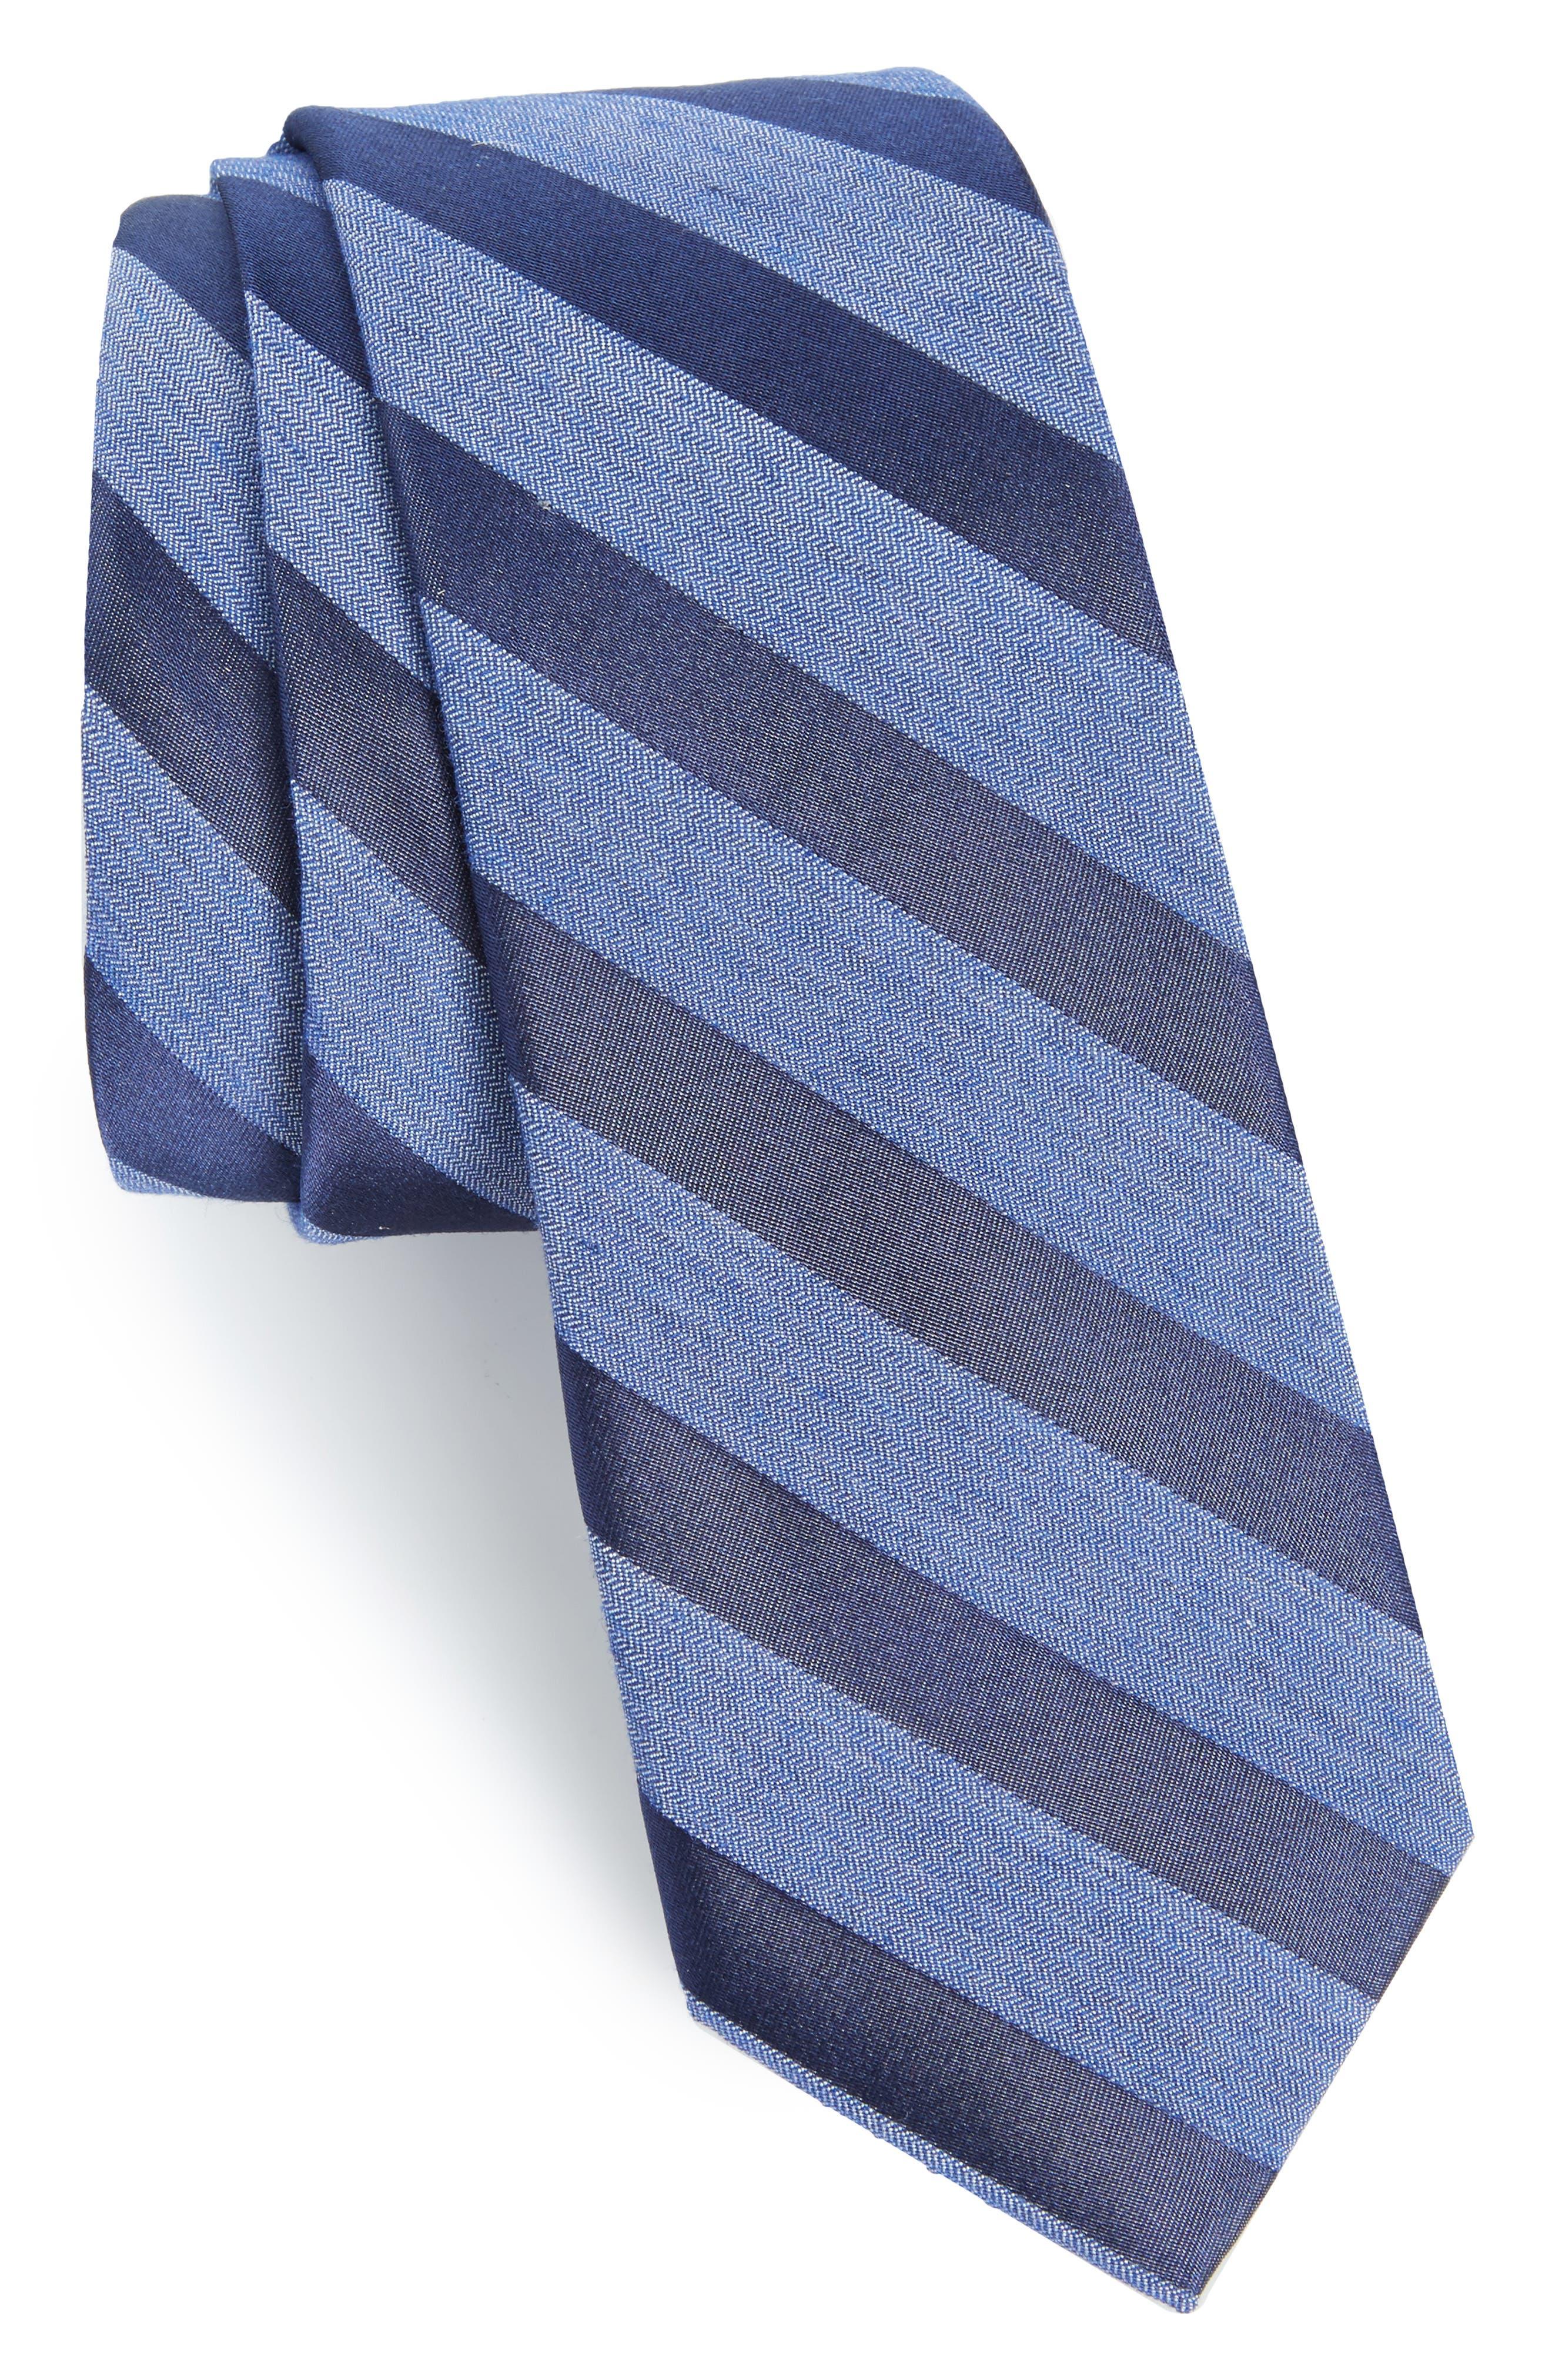 Bar Stripe Silk Blend Skinny Tie,                             Main thumbnail 1, color,                             Navy